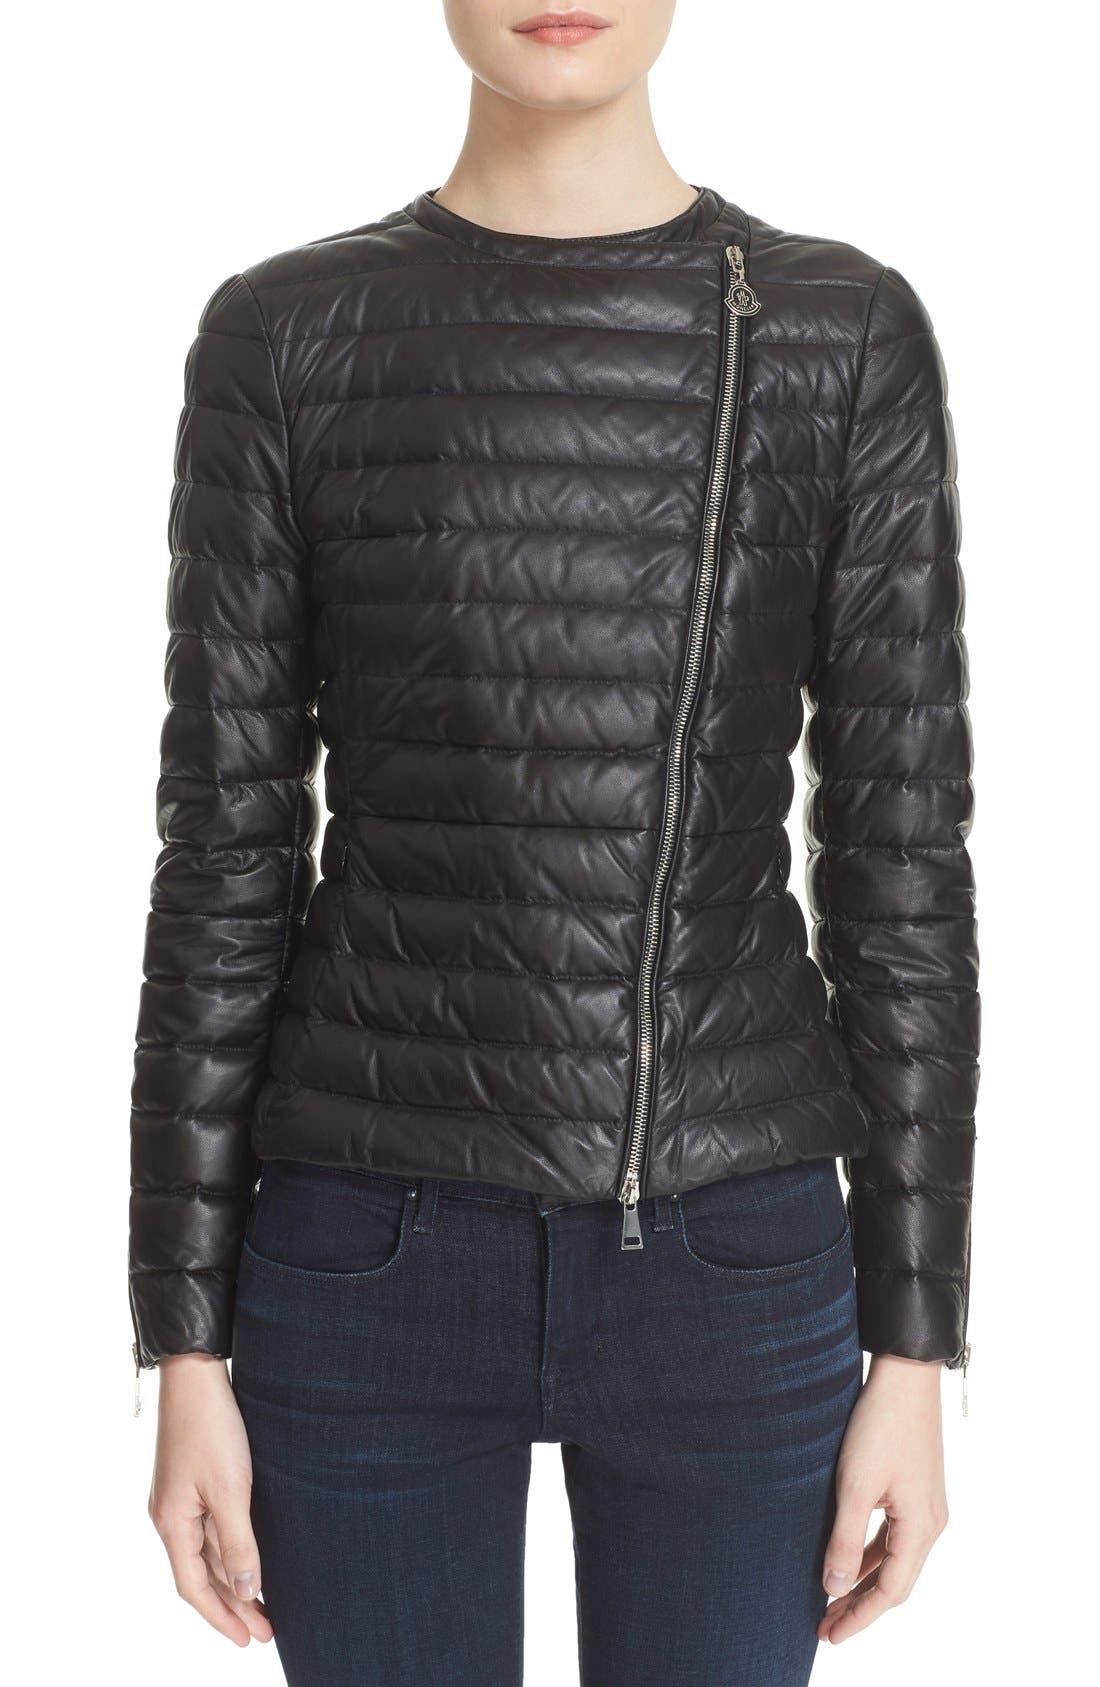 Alternate Image 1 Selected - Moncler 'Palomete' Lambskin Leather Down Moto Jacket